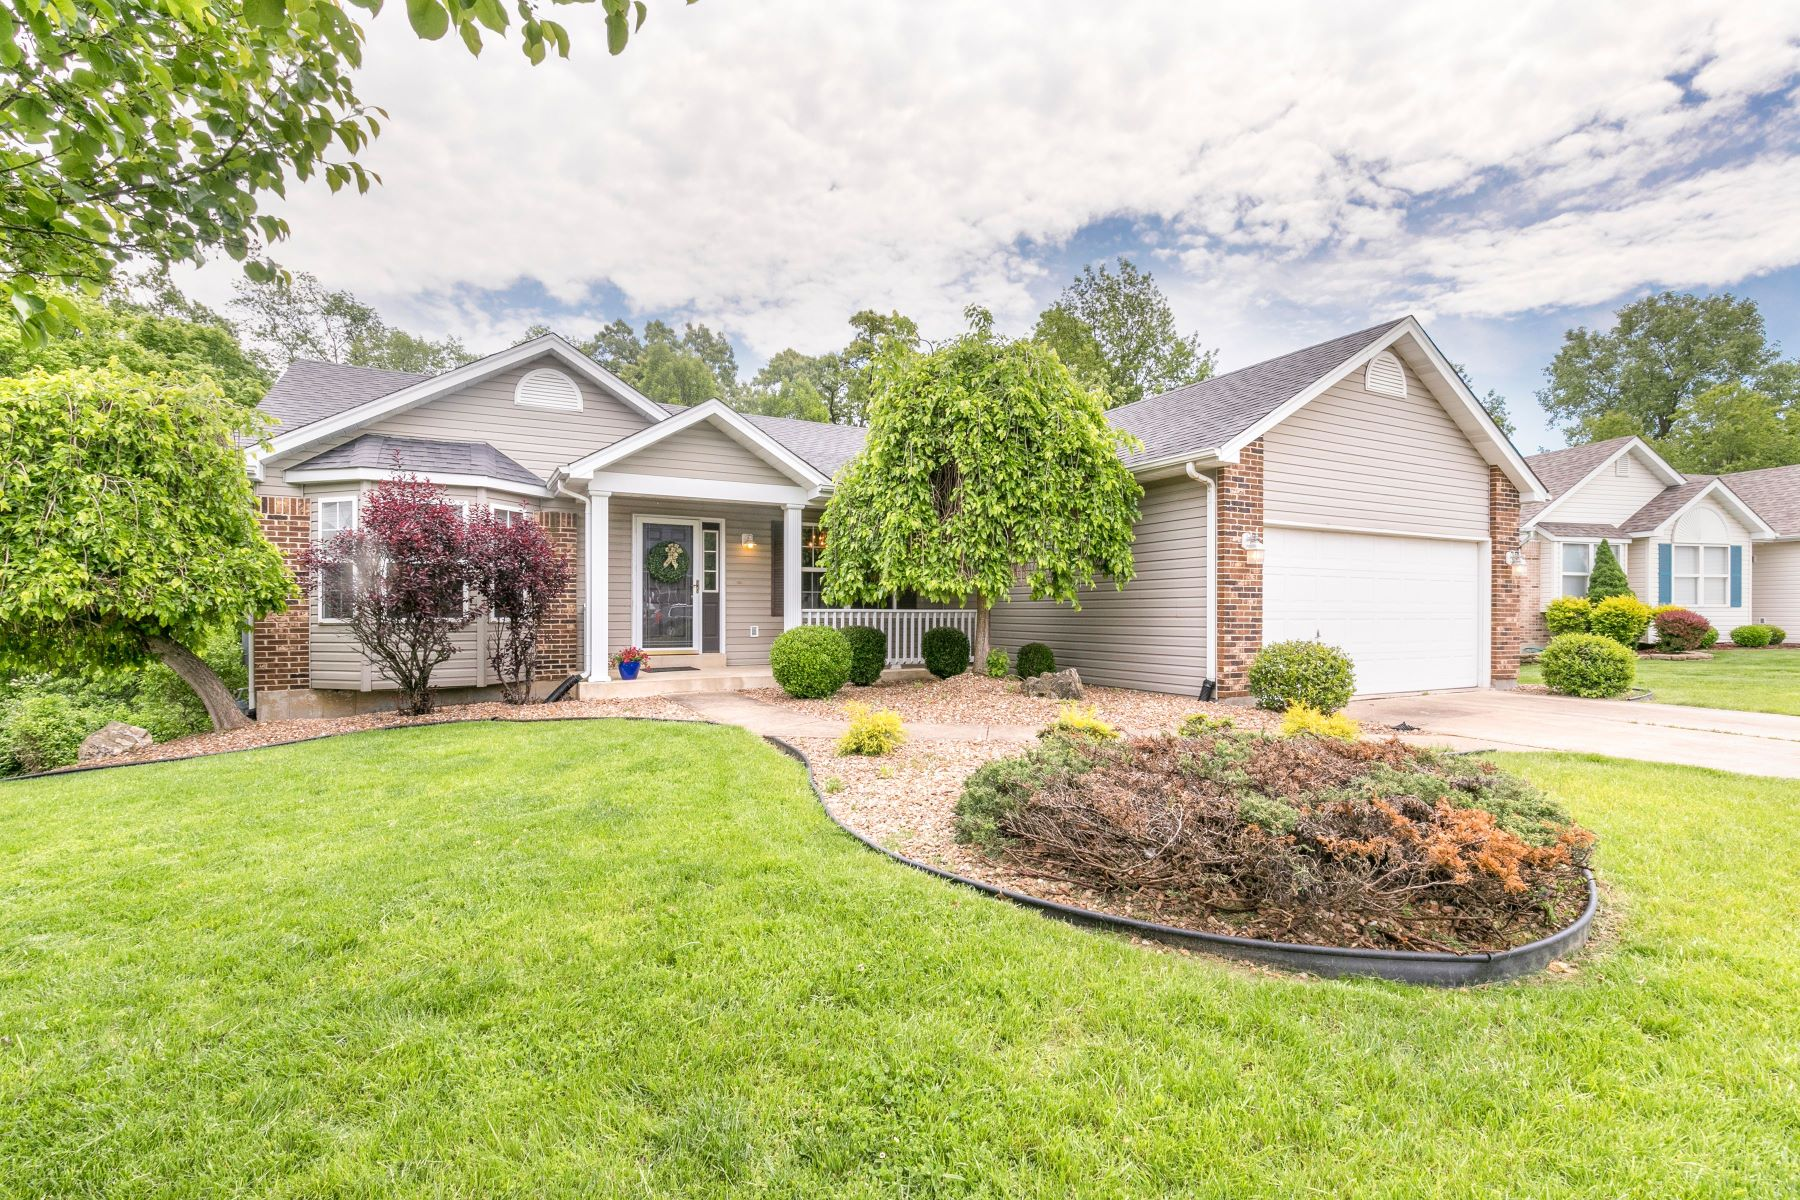 single family homes для того Продажа на 130 Butternut Stage Drive St. Peters, Миссури 63376 Соединенные Штаты